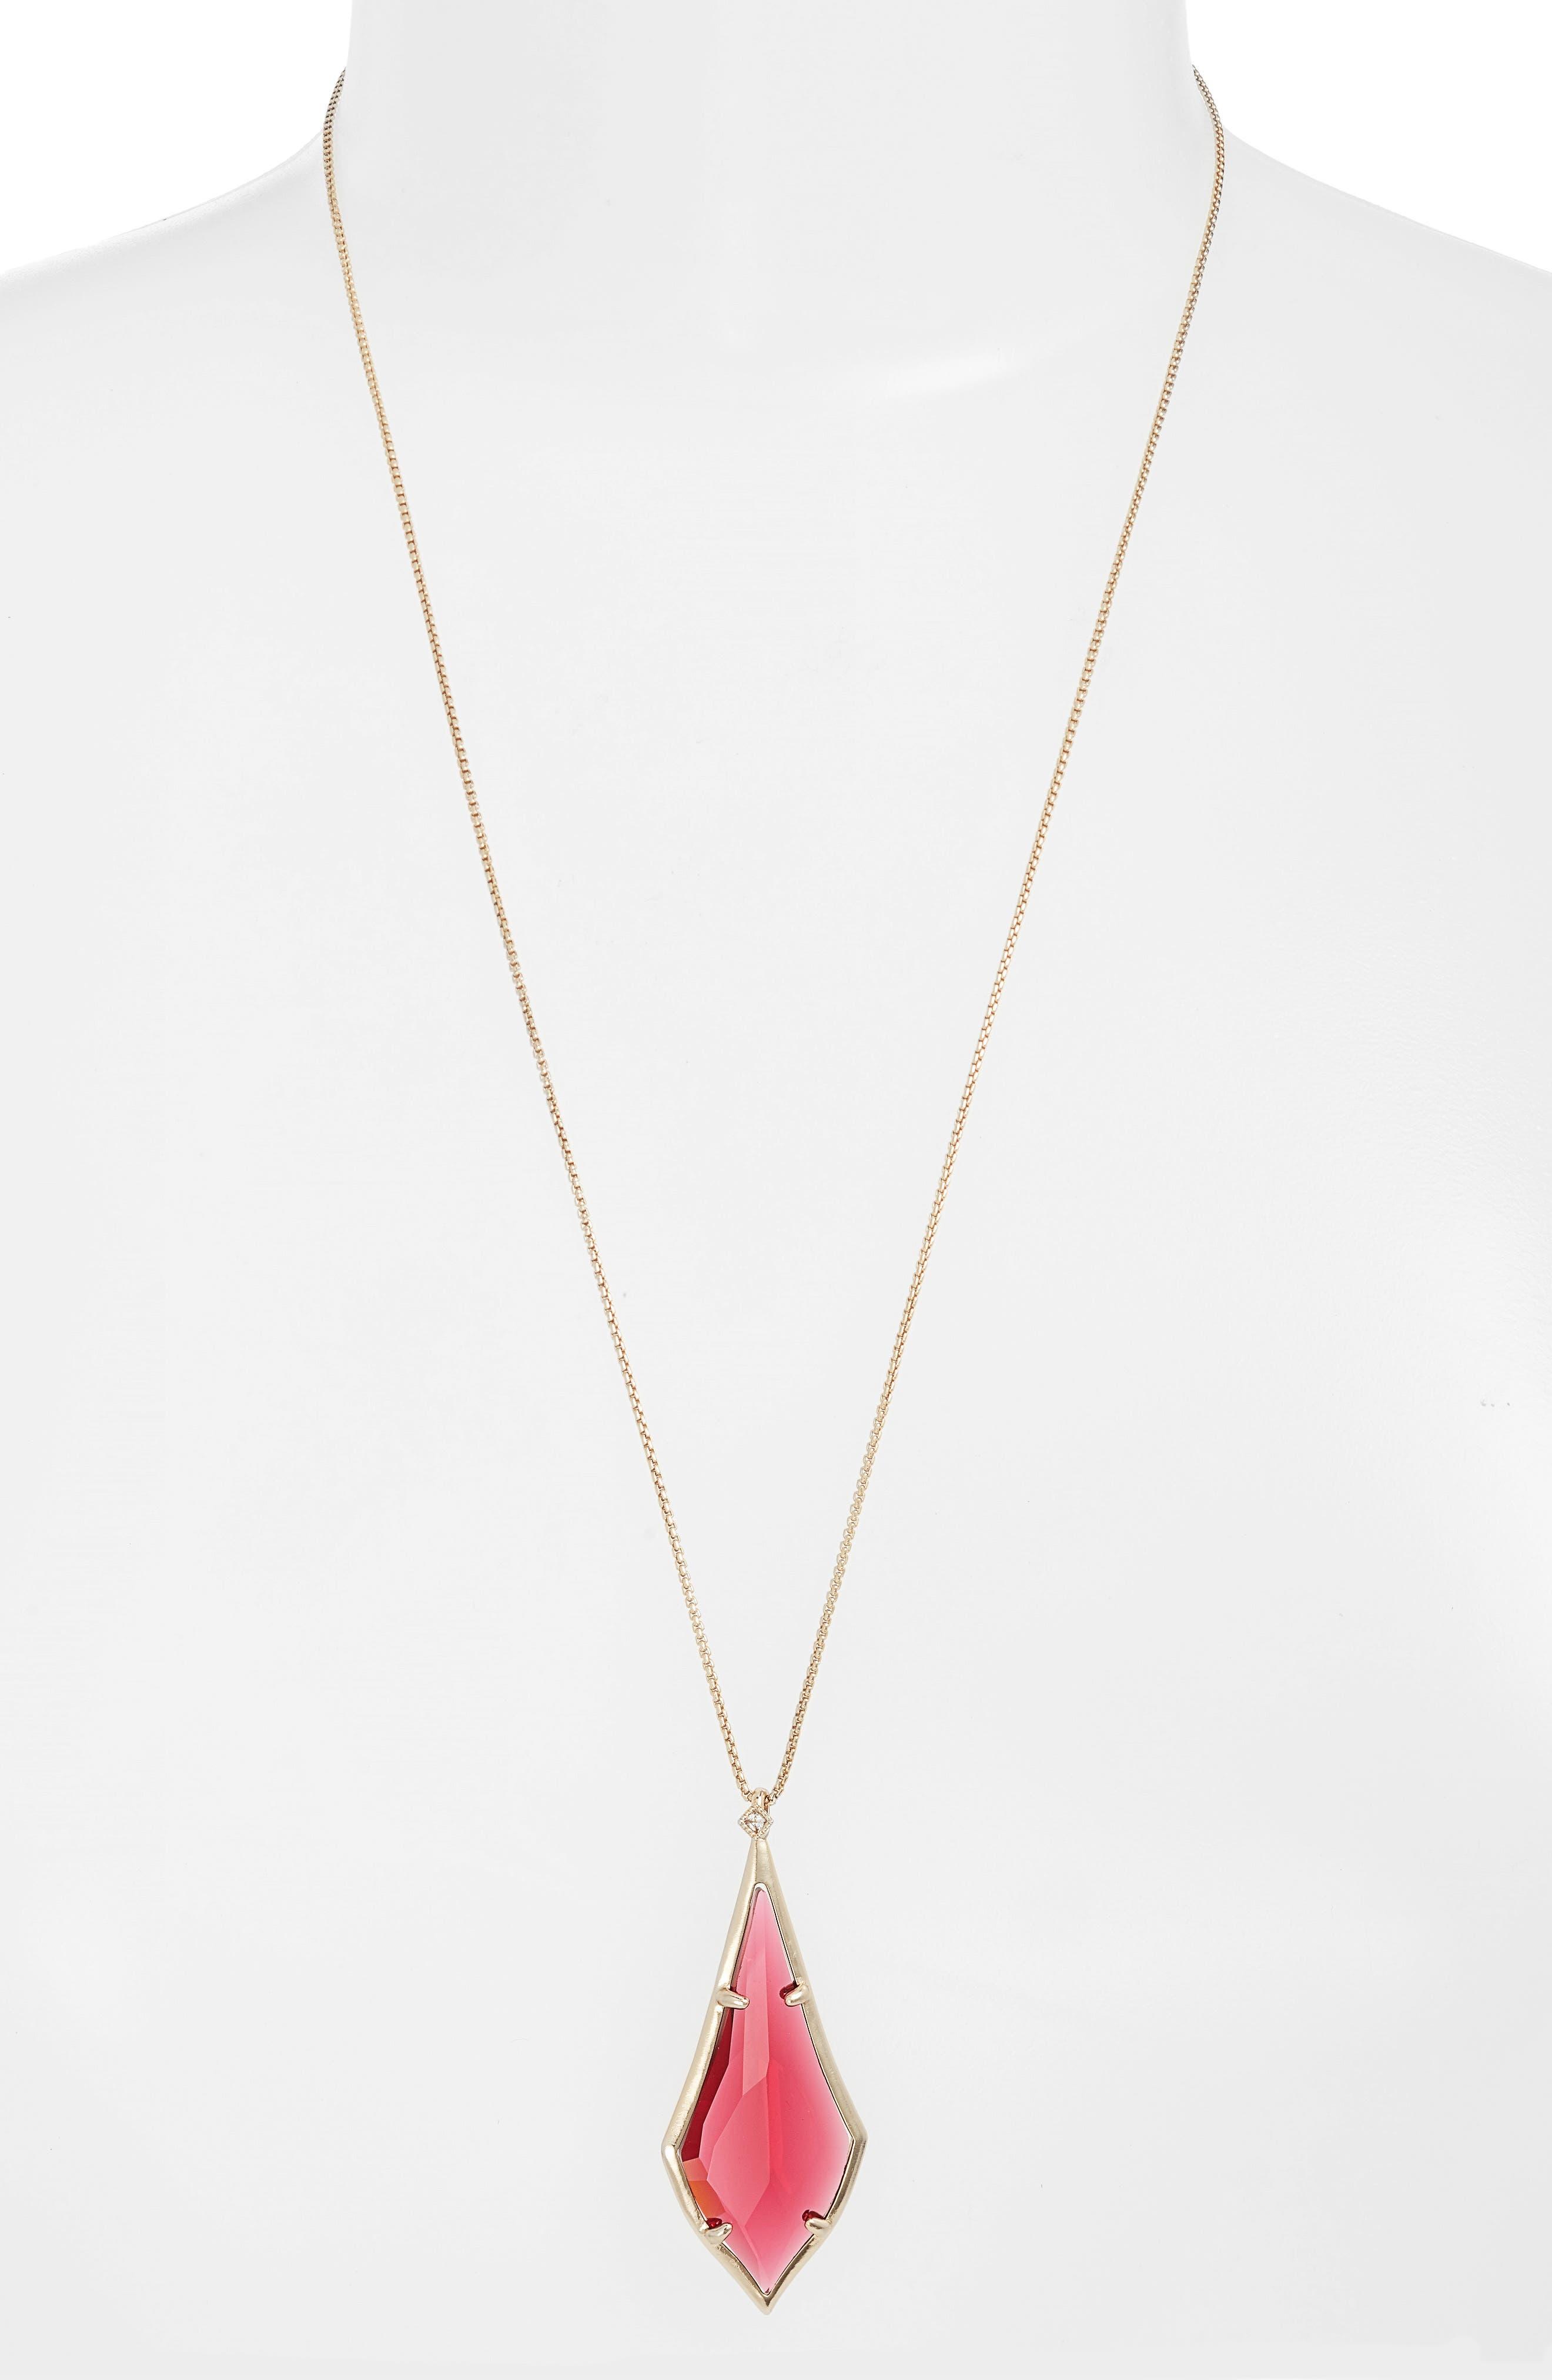 Kendra Scott Damon Pendant Necklace